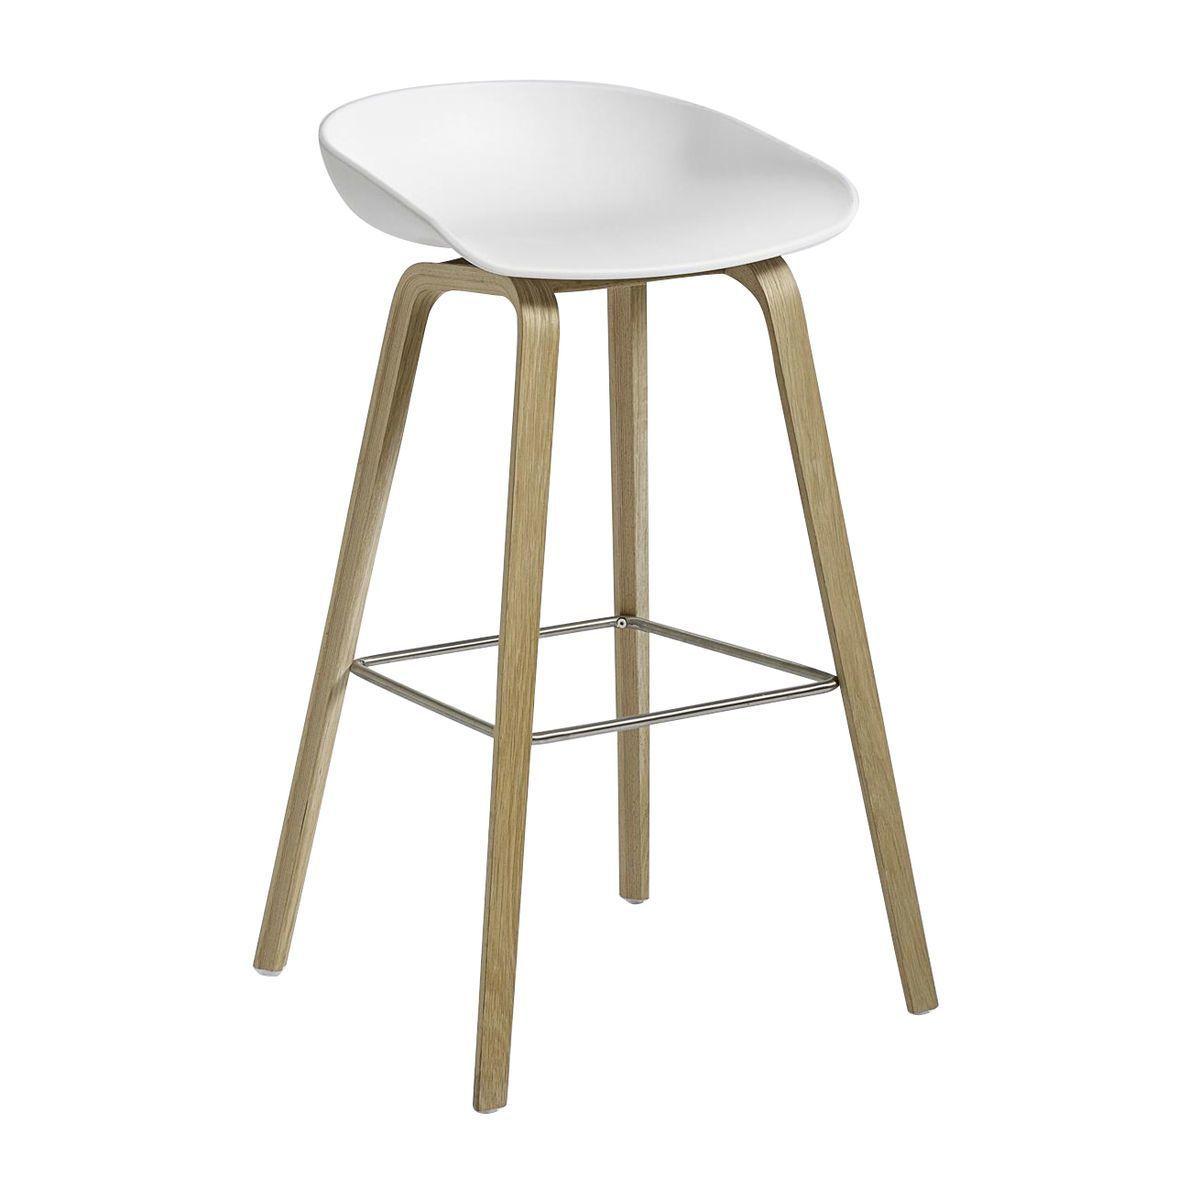 About a stool aas32 barhocker 75cm hay for Barhocker ersatzteile